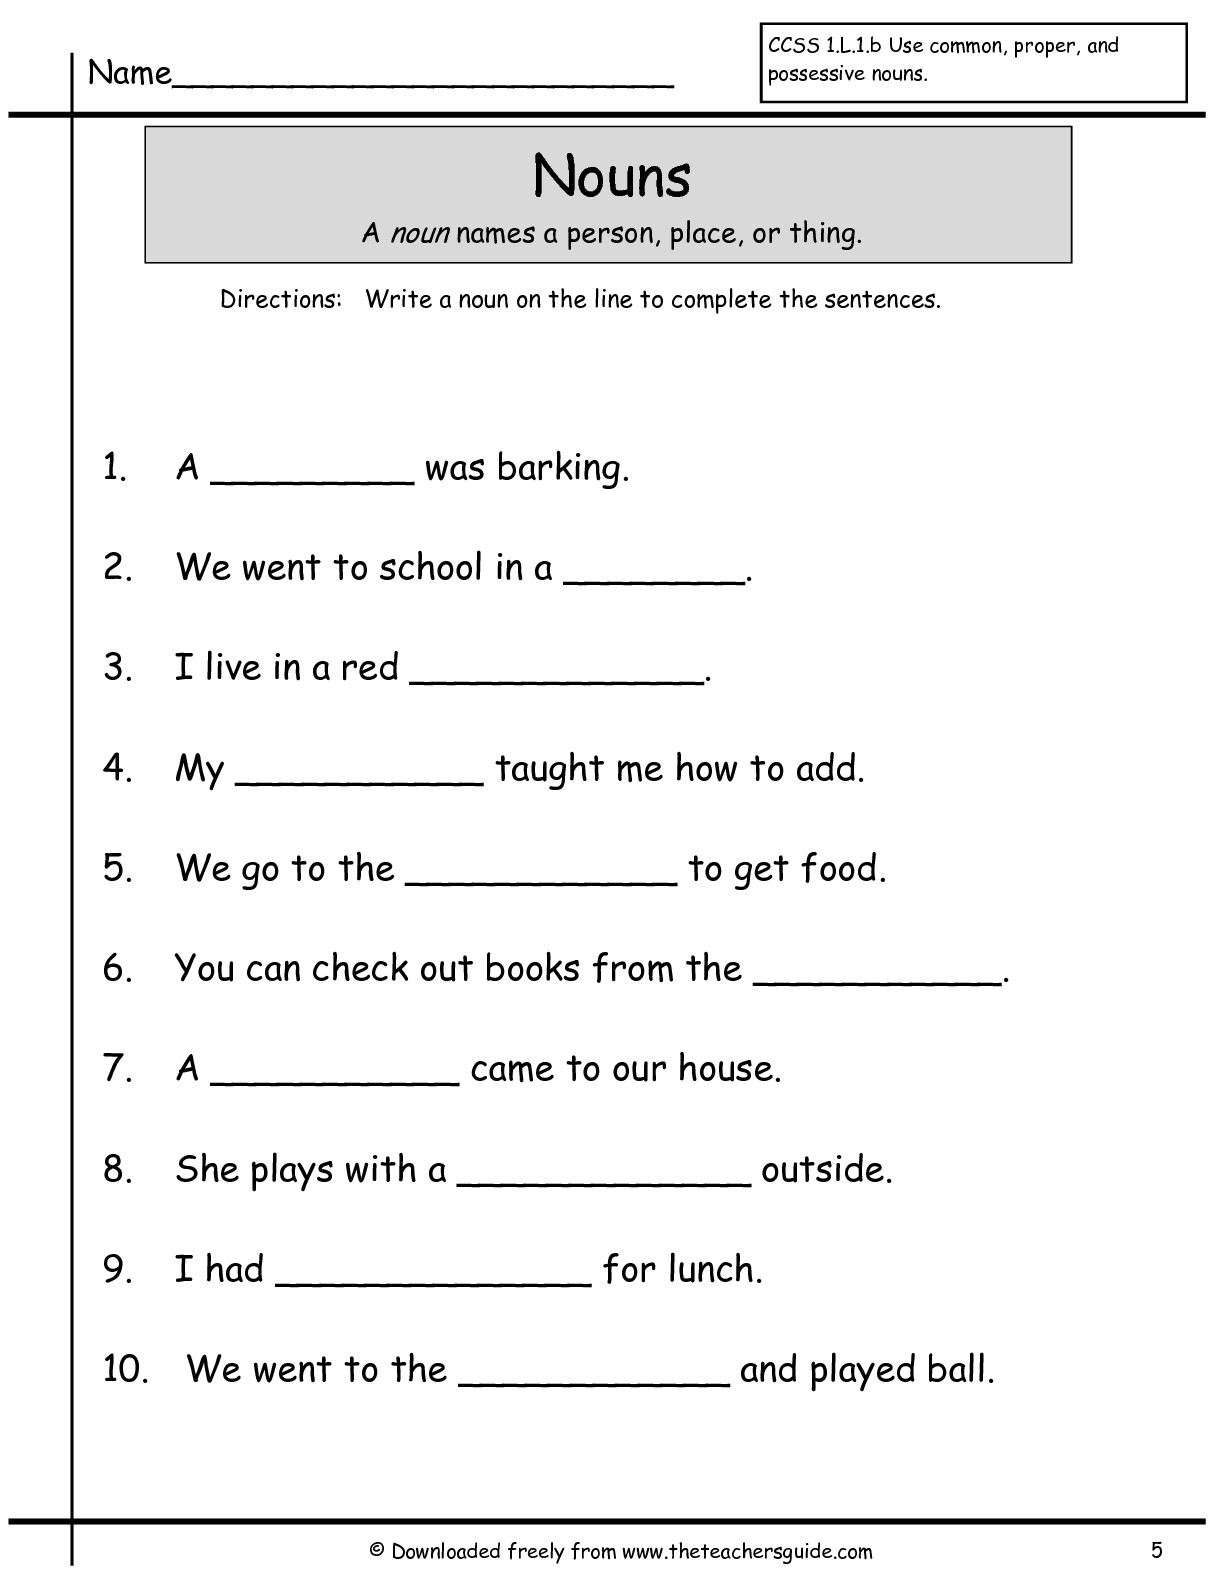 16 Best Images Of Unscramble Sentences Worksheets First Grade